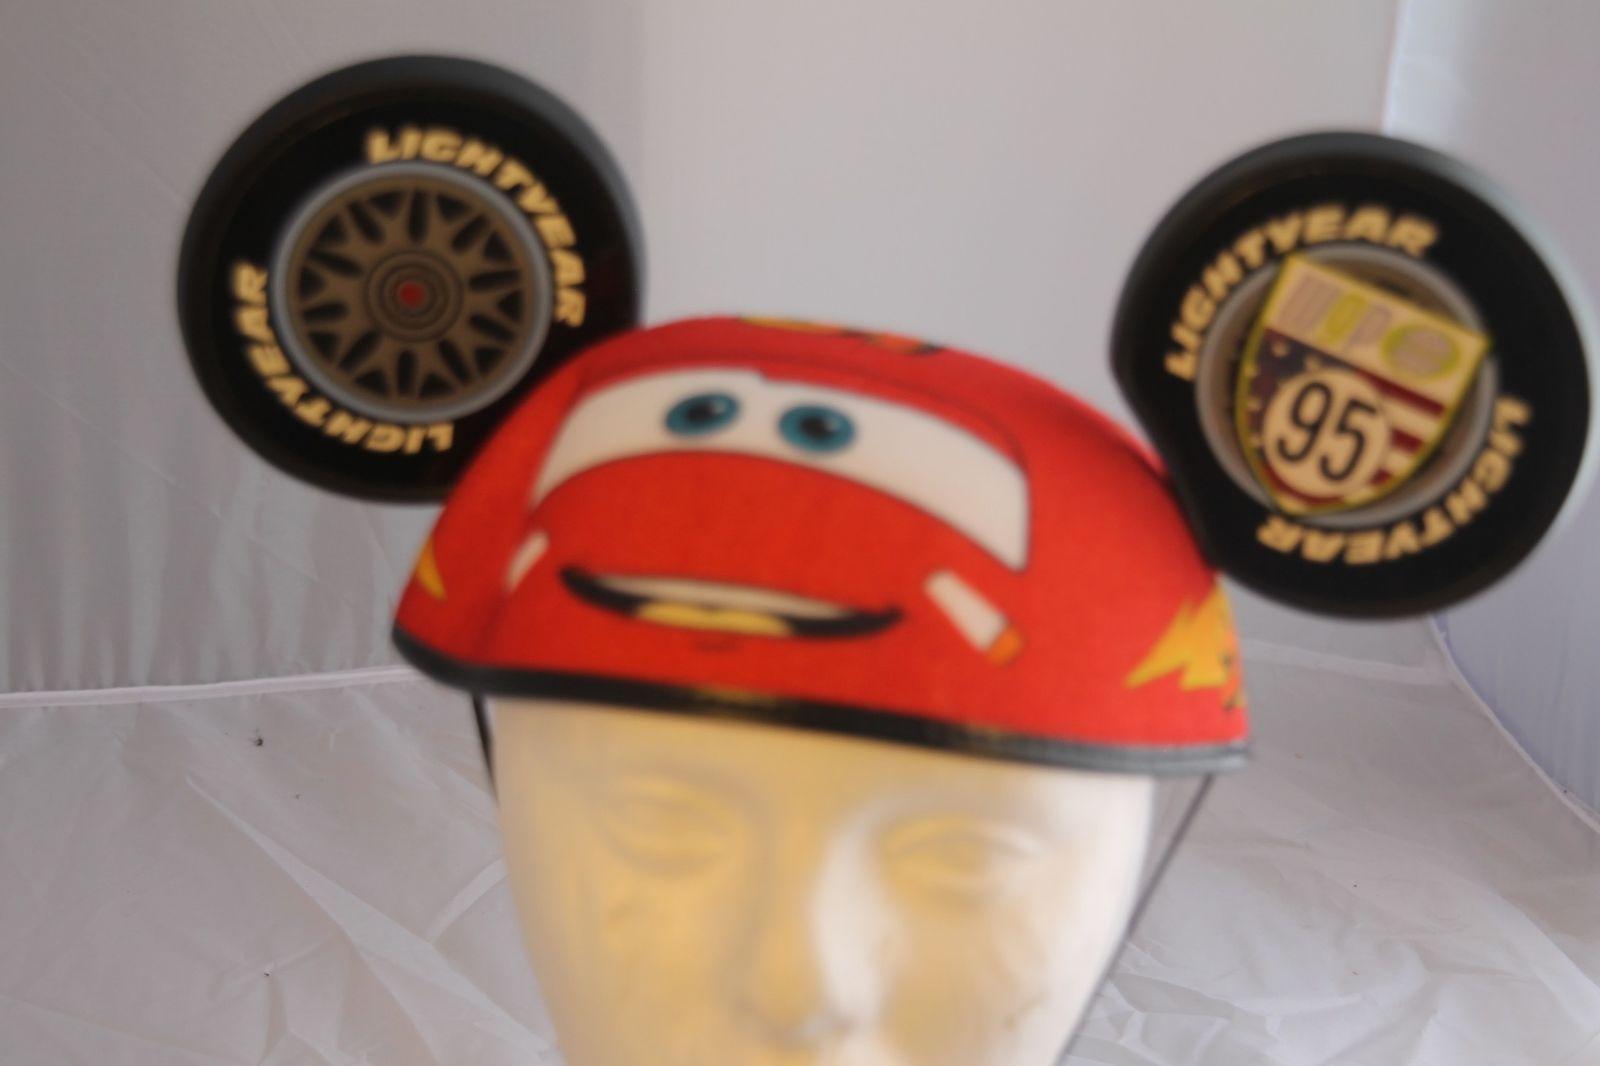 bb4148823dc37 S l1600. S l1600. Disney Theme Parks Cars Lightening Hat Mickey Mouse Ears  ...